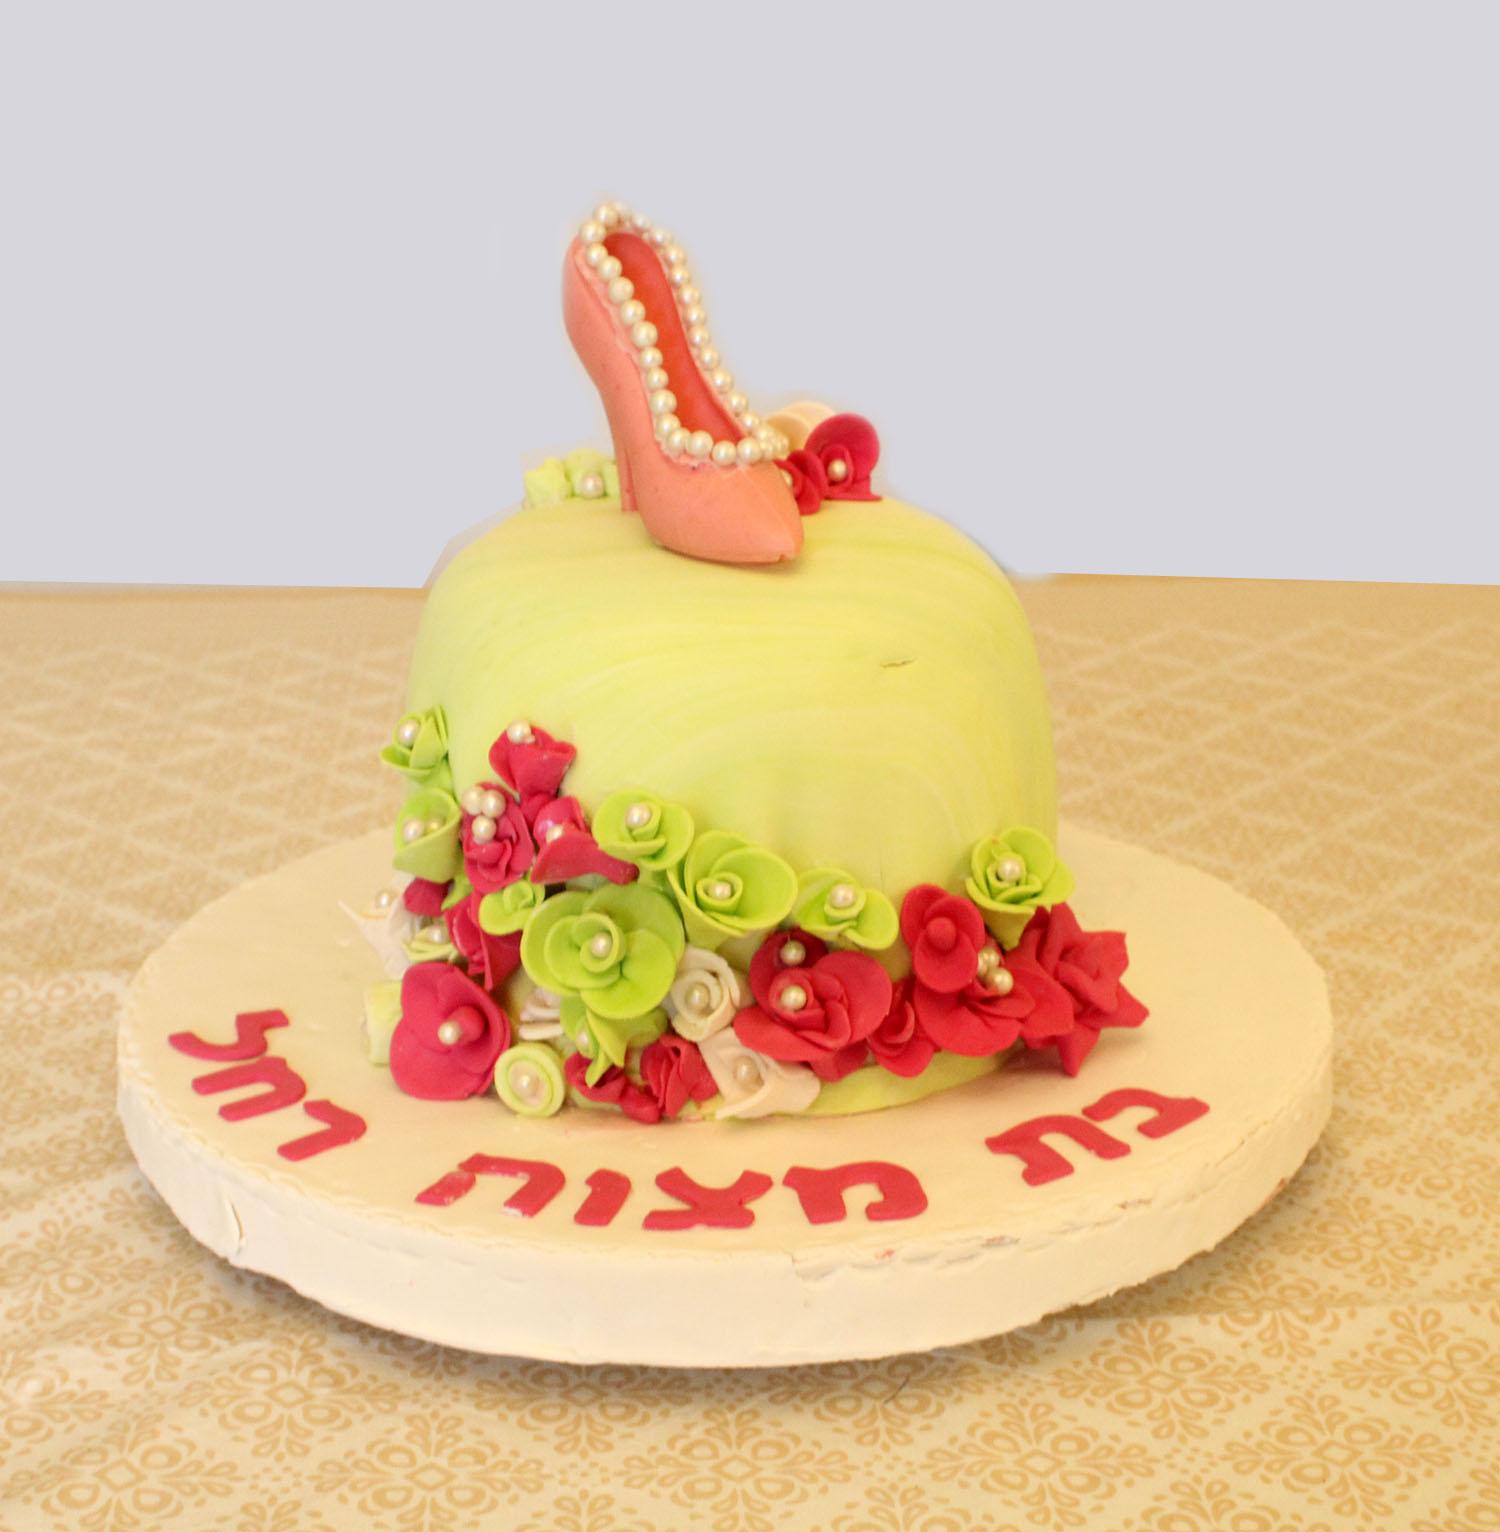 IMG 6337 - עוגה לבת מצוה